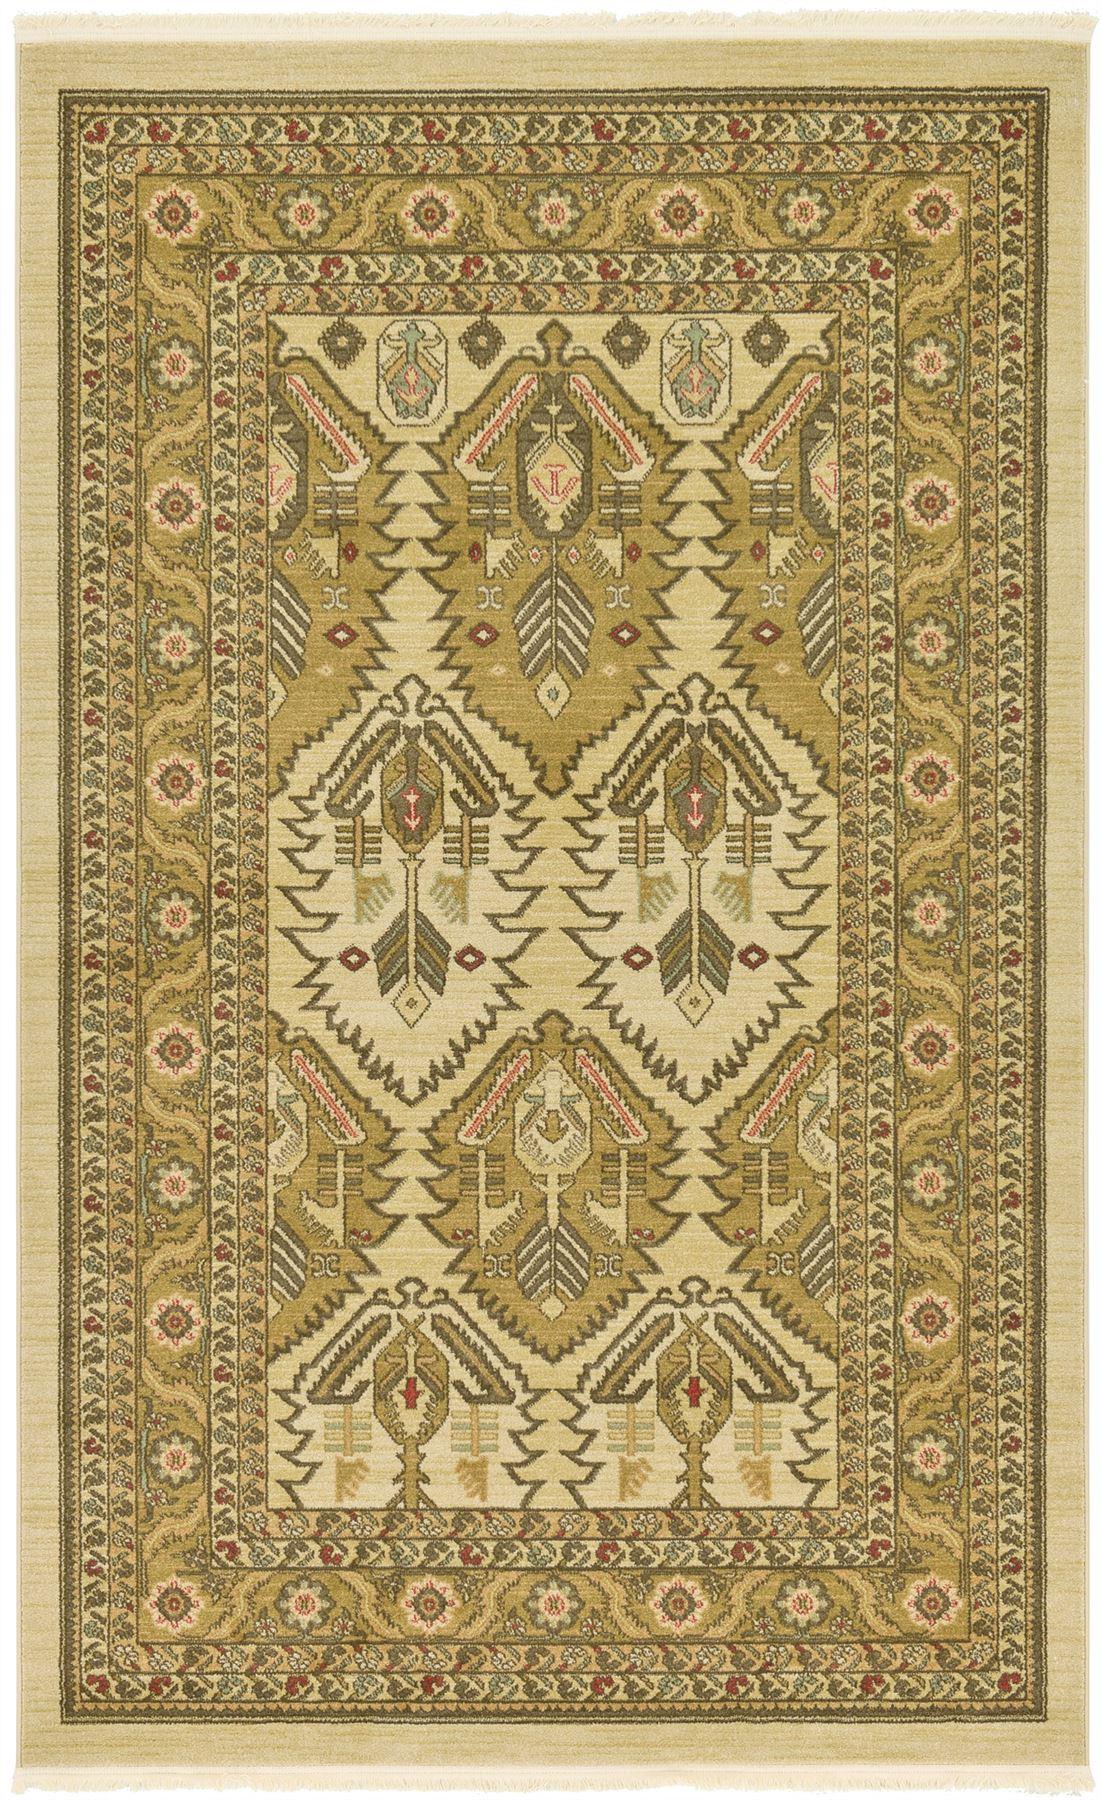 traditional persian rugs new large area rug oriental heriz. Black Bedroom Furniture Sets. Home Design Ideas